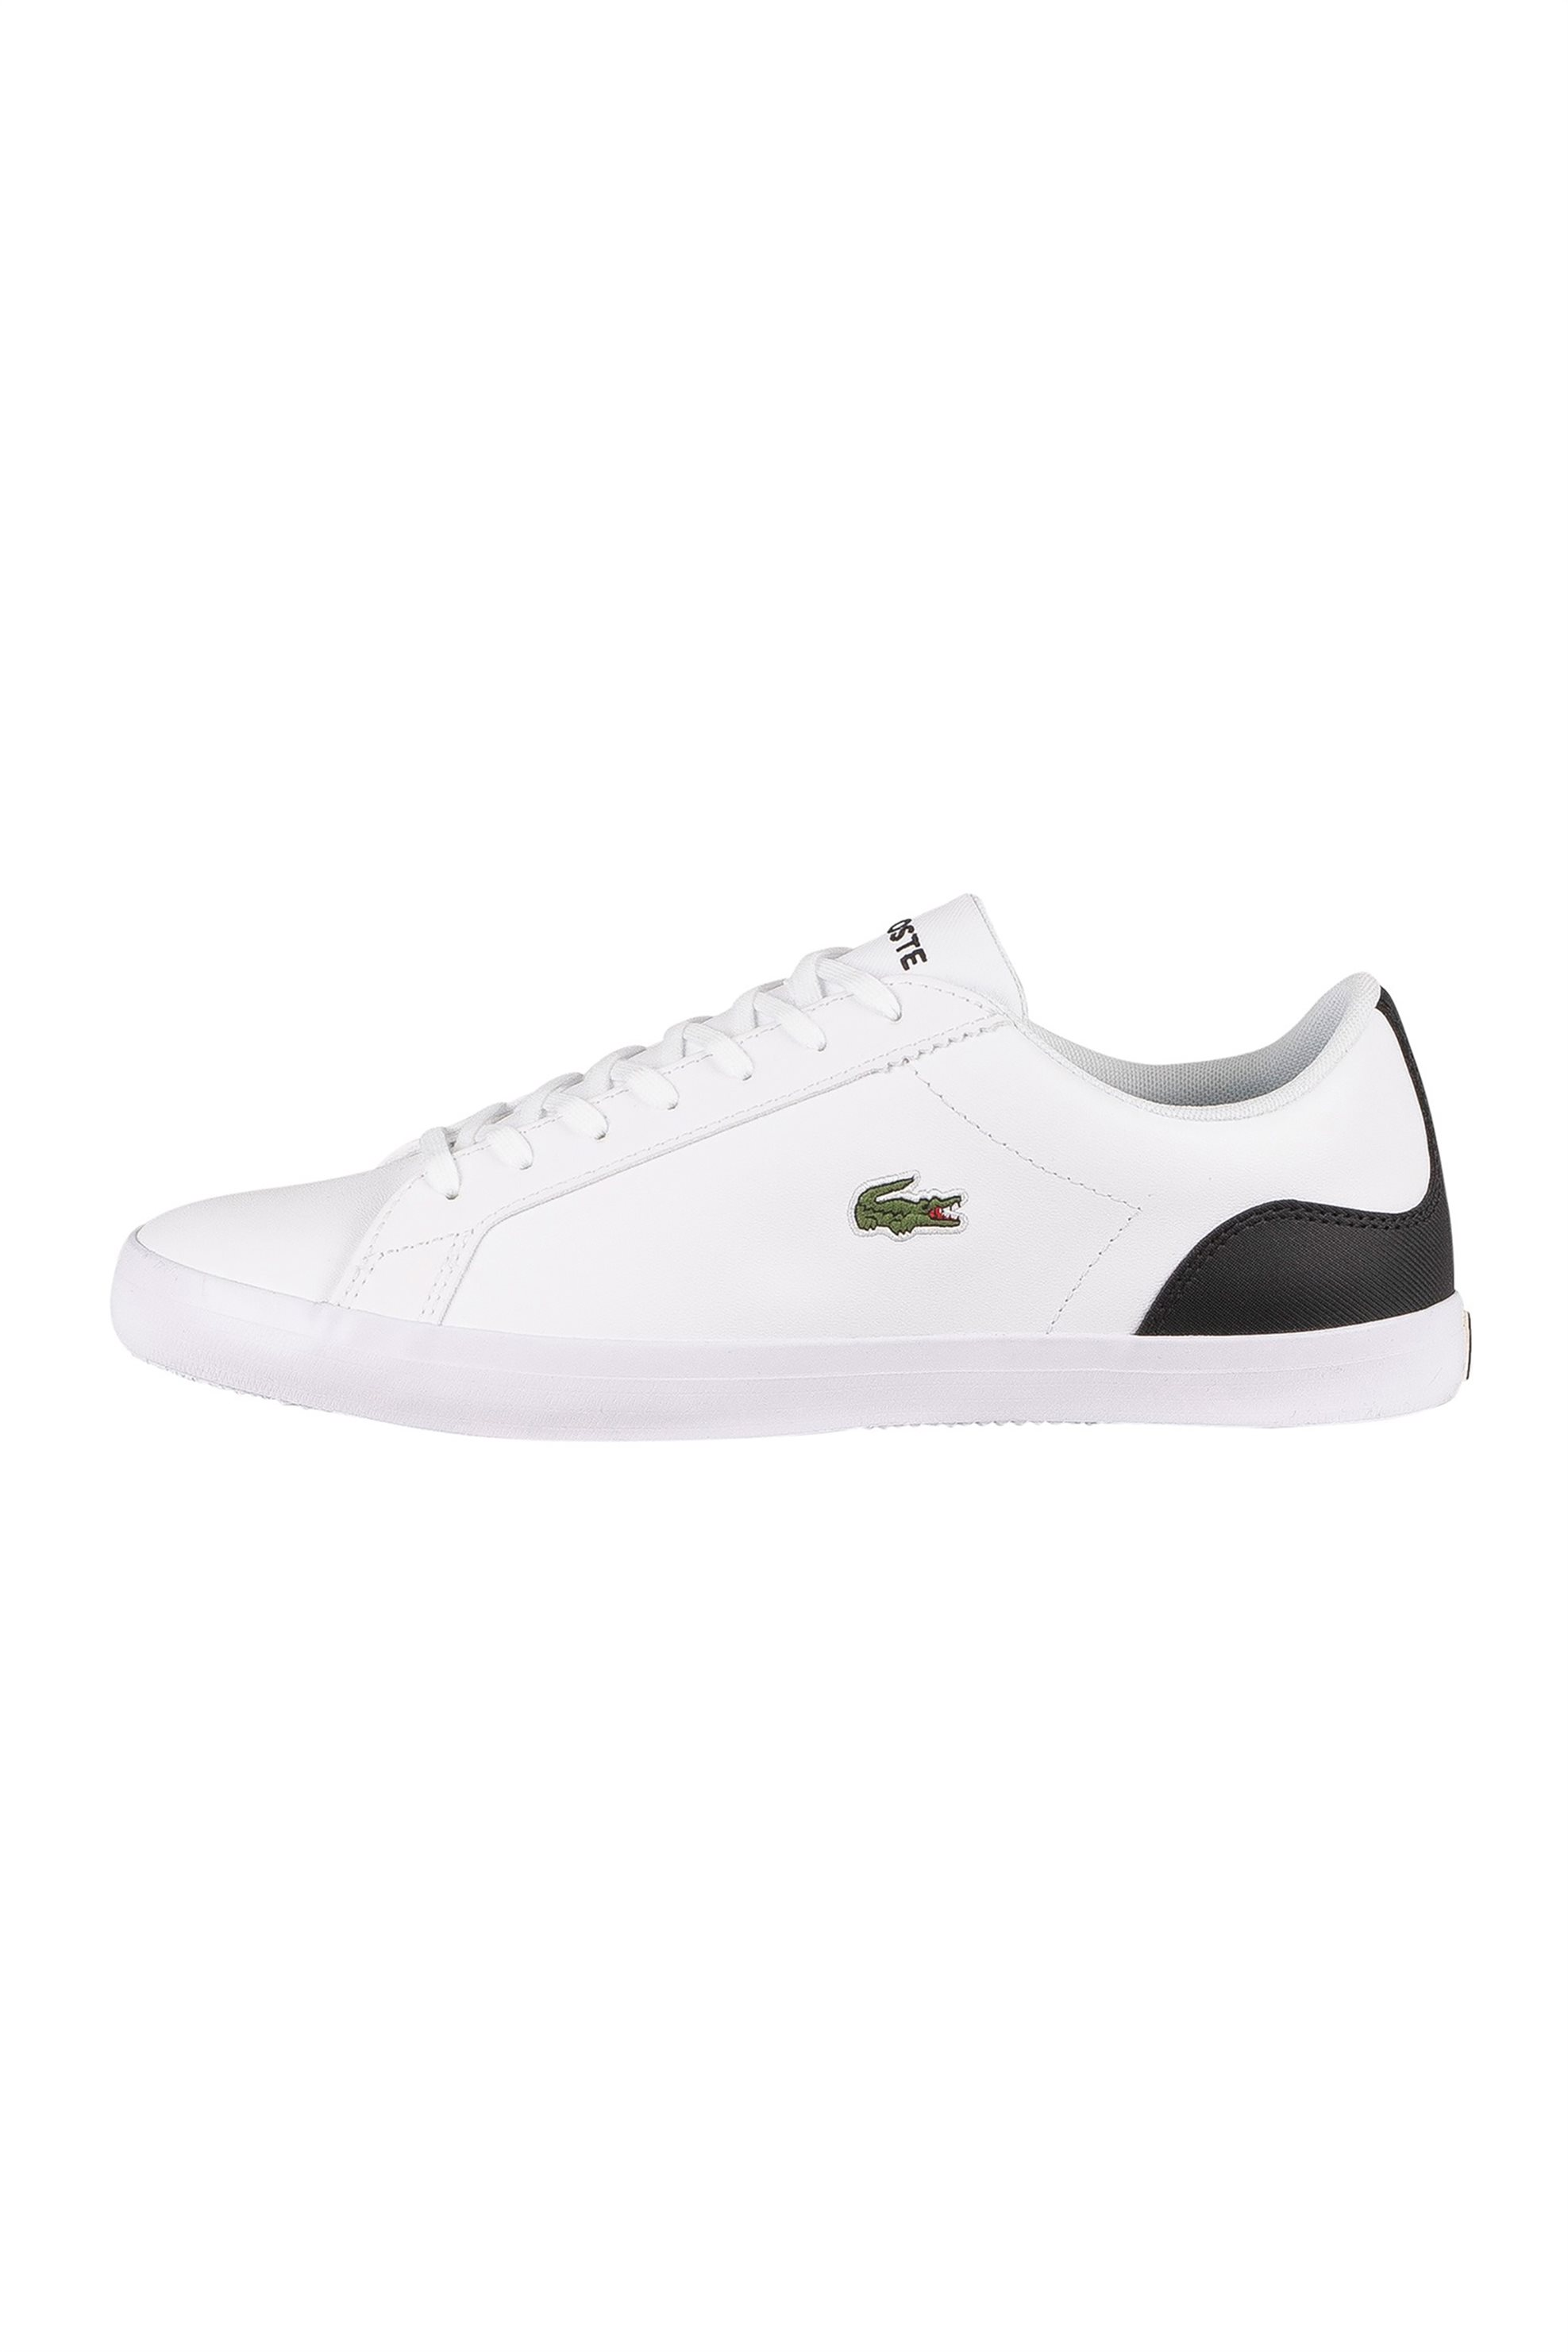 "Lacoste ανδρικα sneakers με κεντημένο λογότυπο ""Lerond 0120"" – 40CMA0027147 – Λευκό"